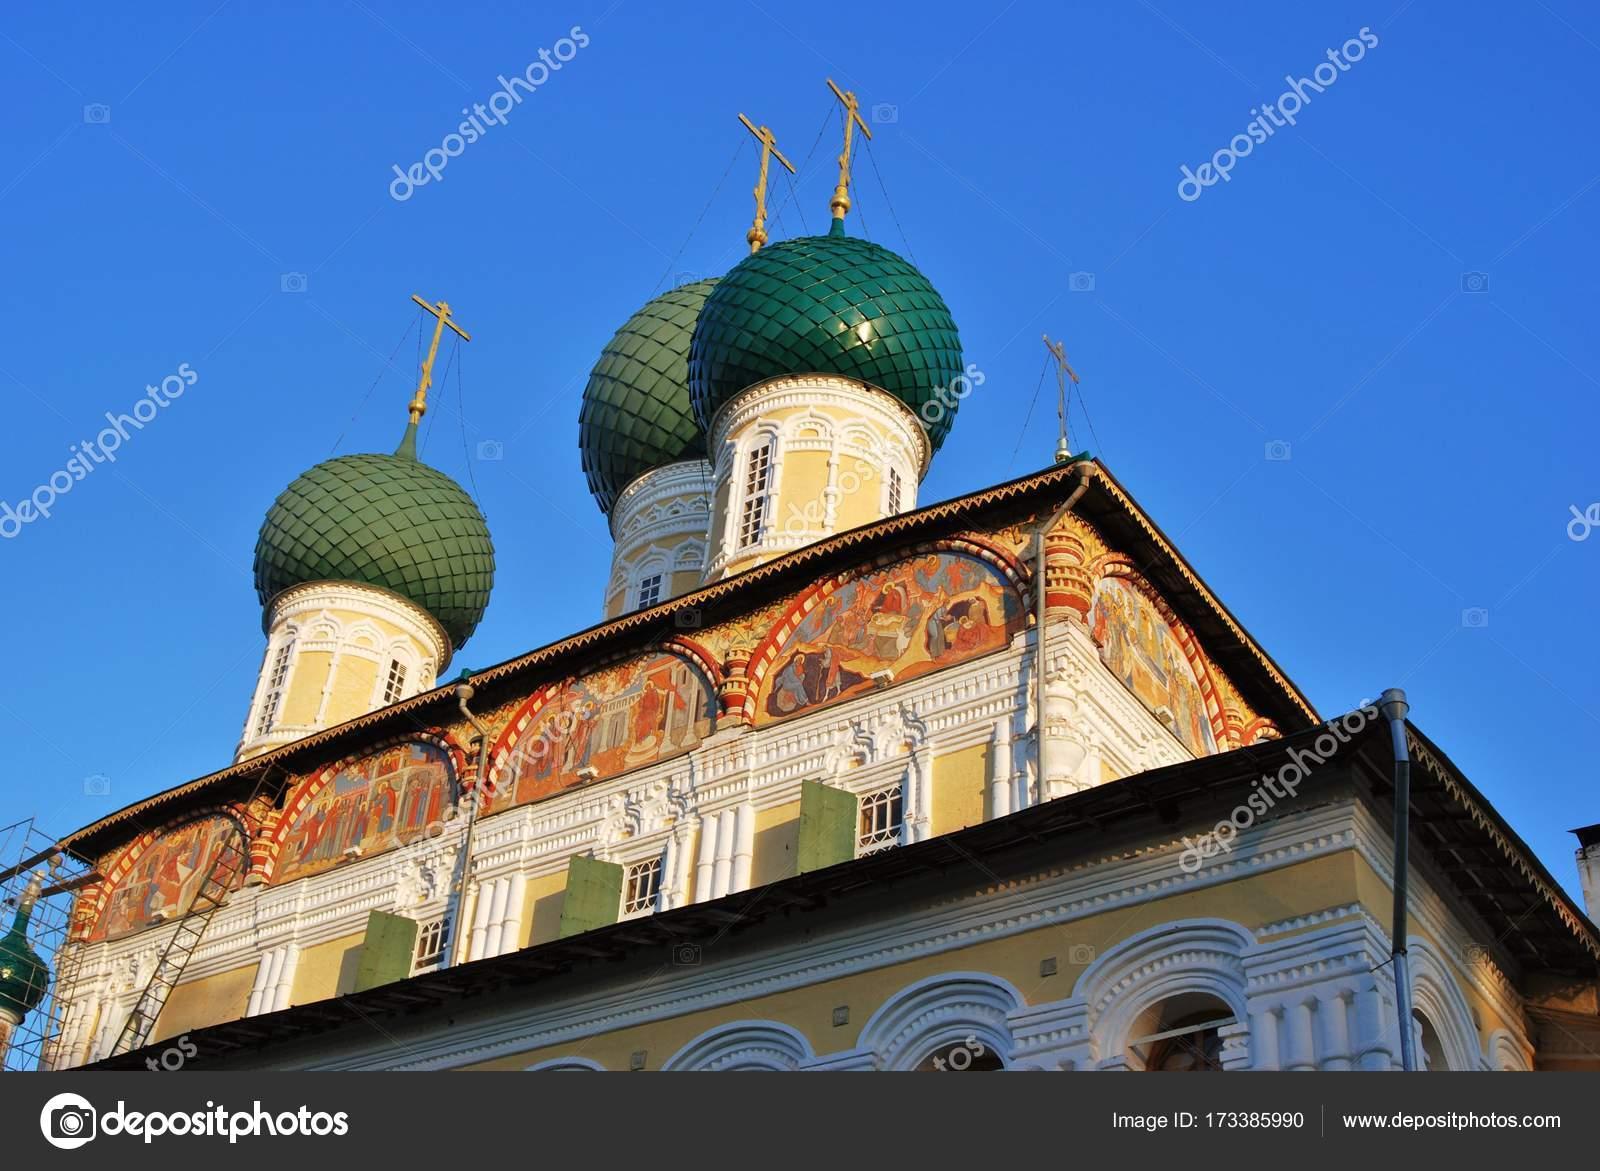 Resurrection Cathedral Tutaev: photos, address and history 29